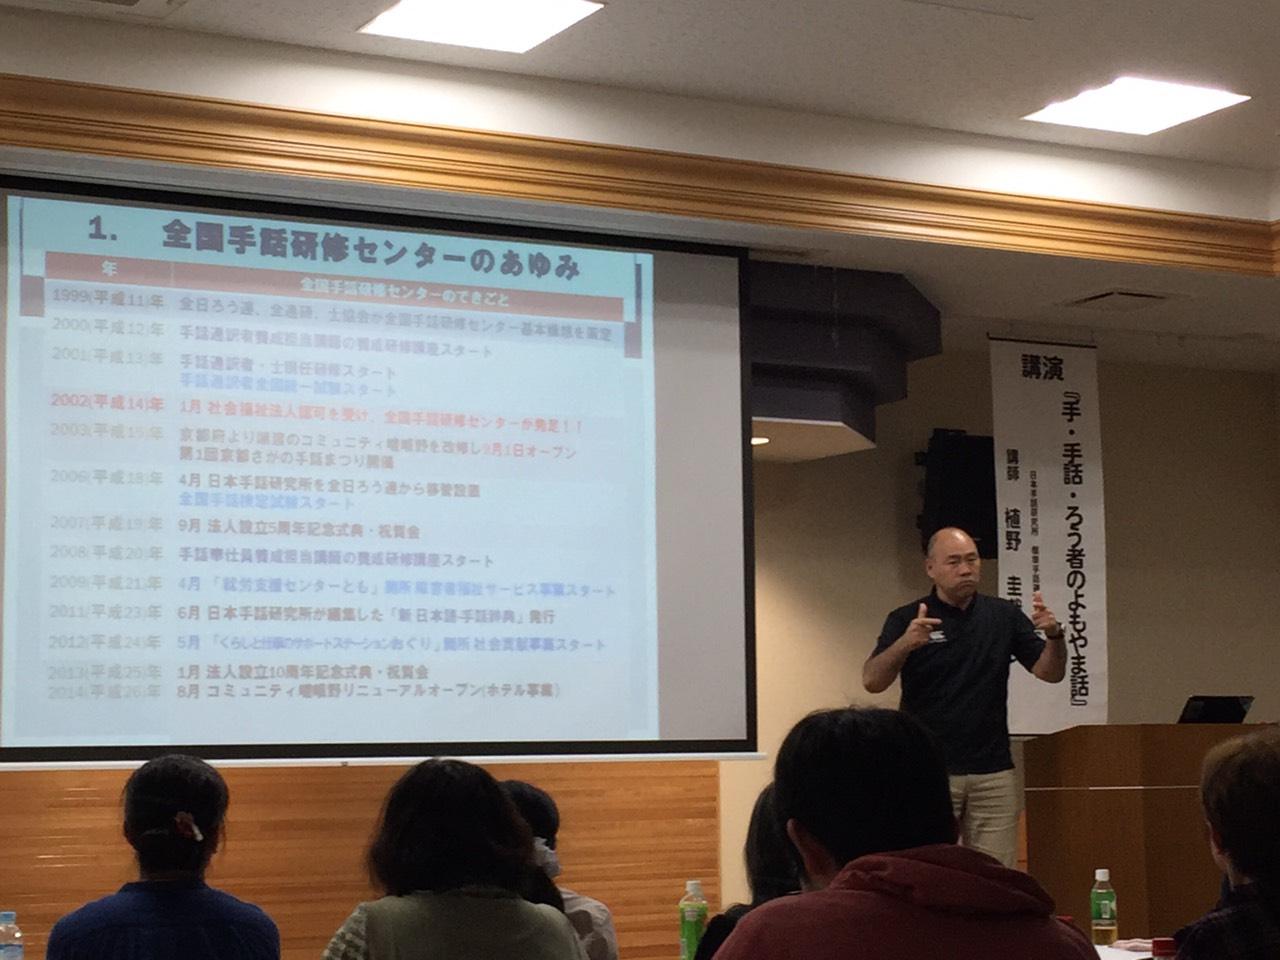 2015福島市での後援会活動